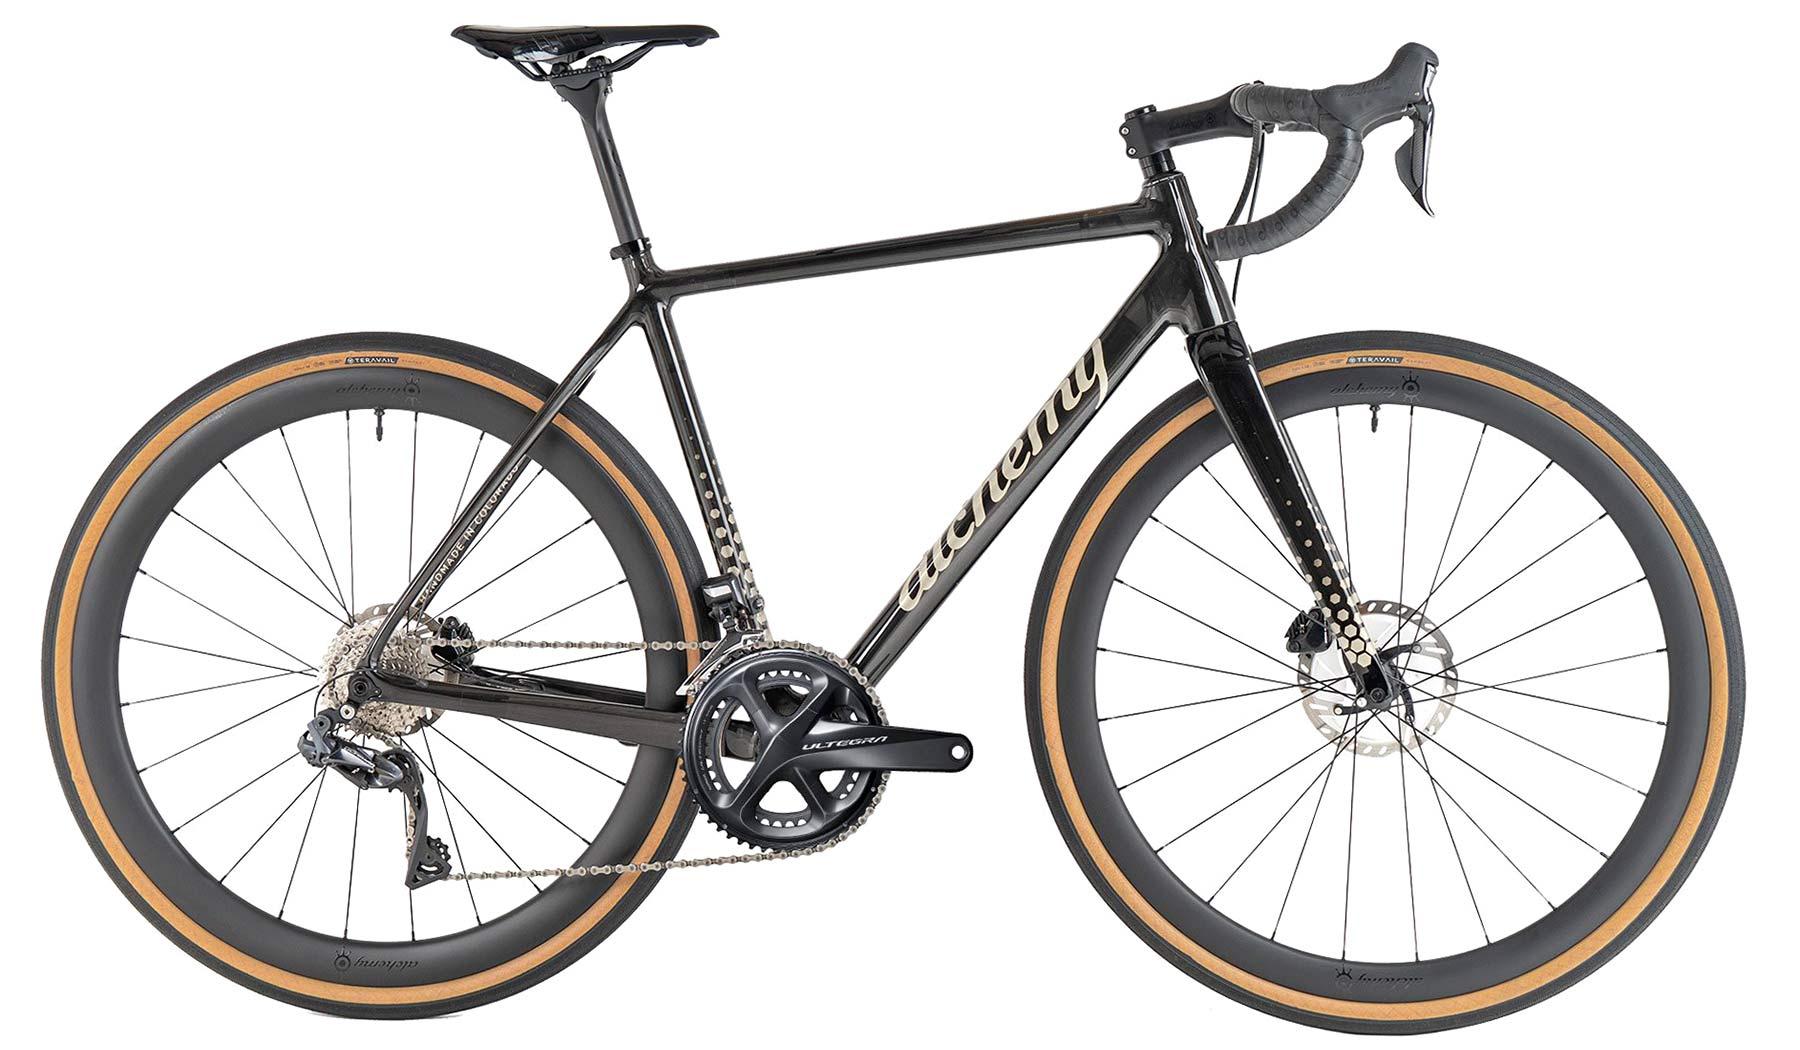 2021 Alchemy Atlas custom carbon or titanium all-road bikes,all-road 38mm